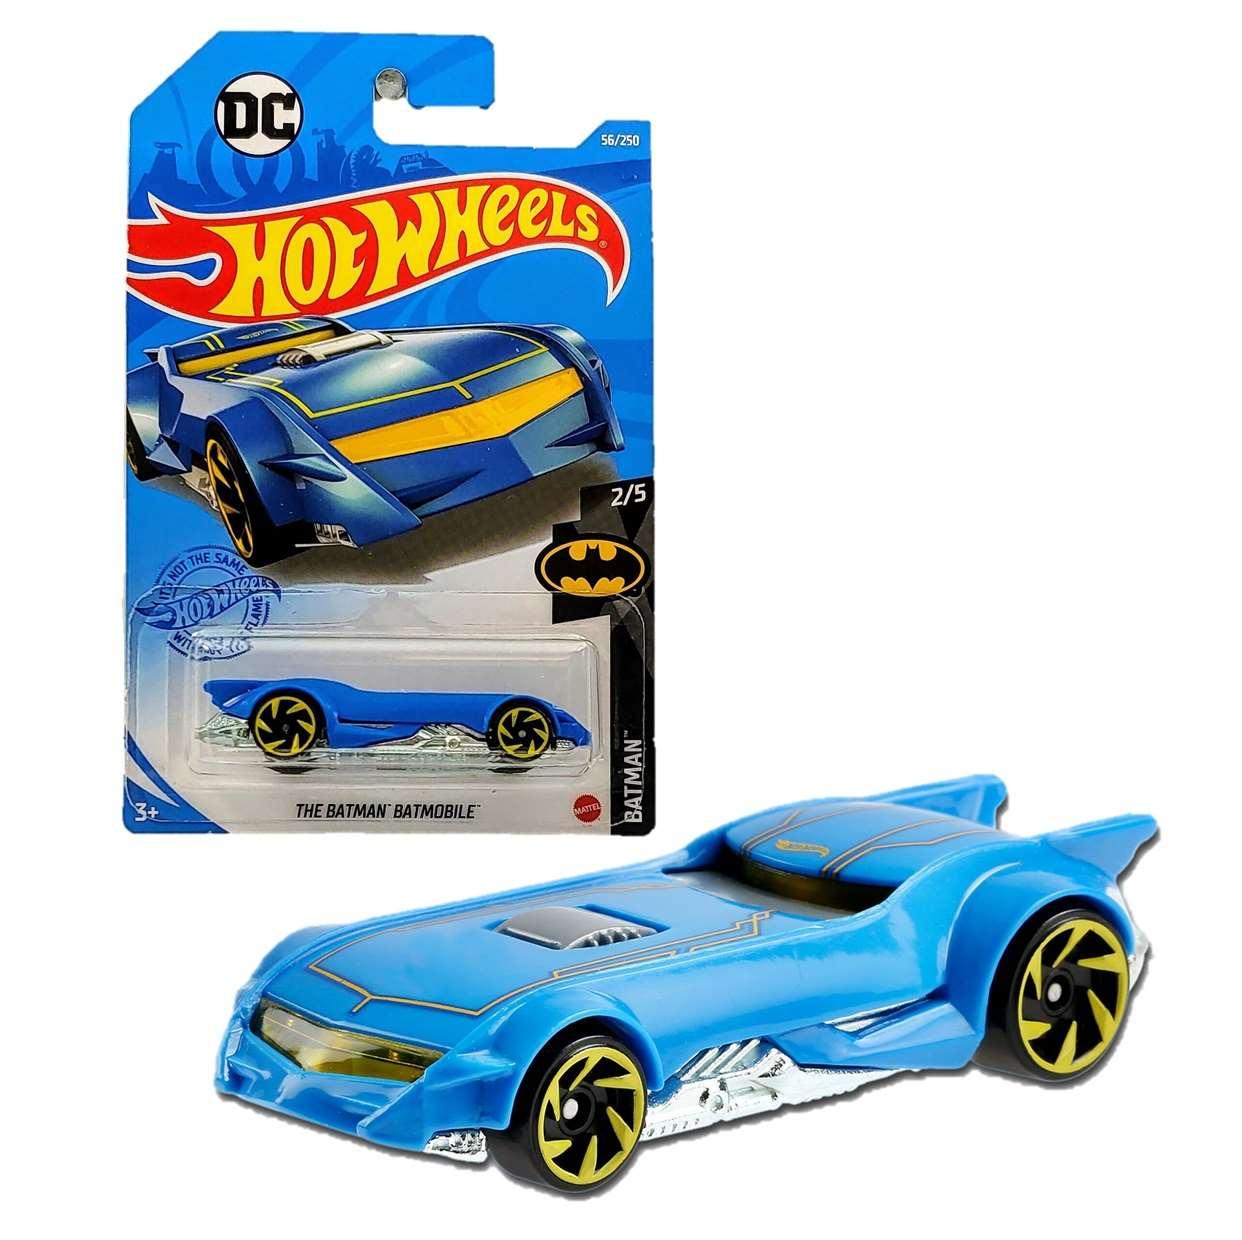 Batmobile Azul 2/5 Hot Wheels Dc The Batman 56/250